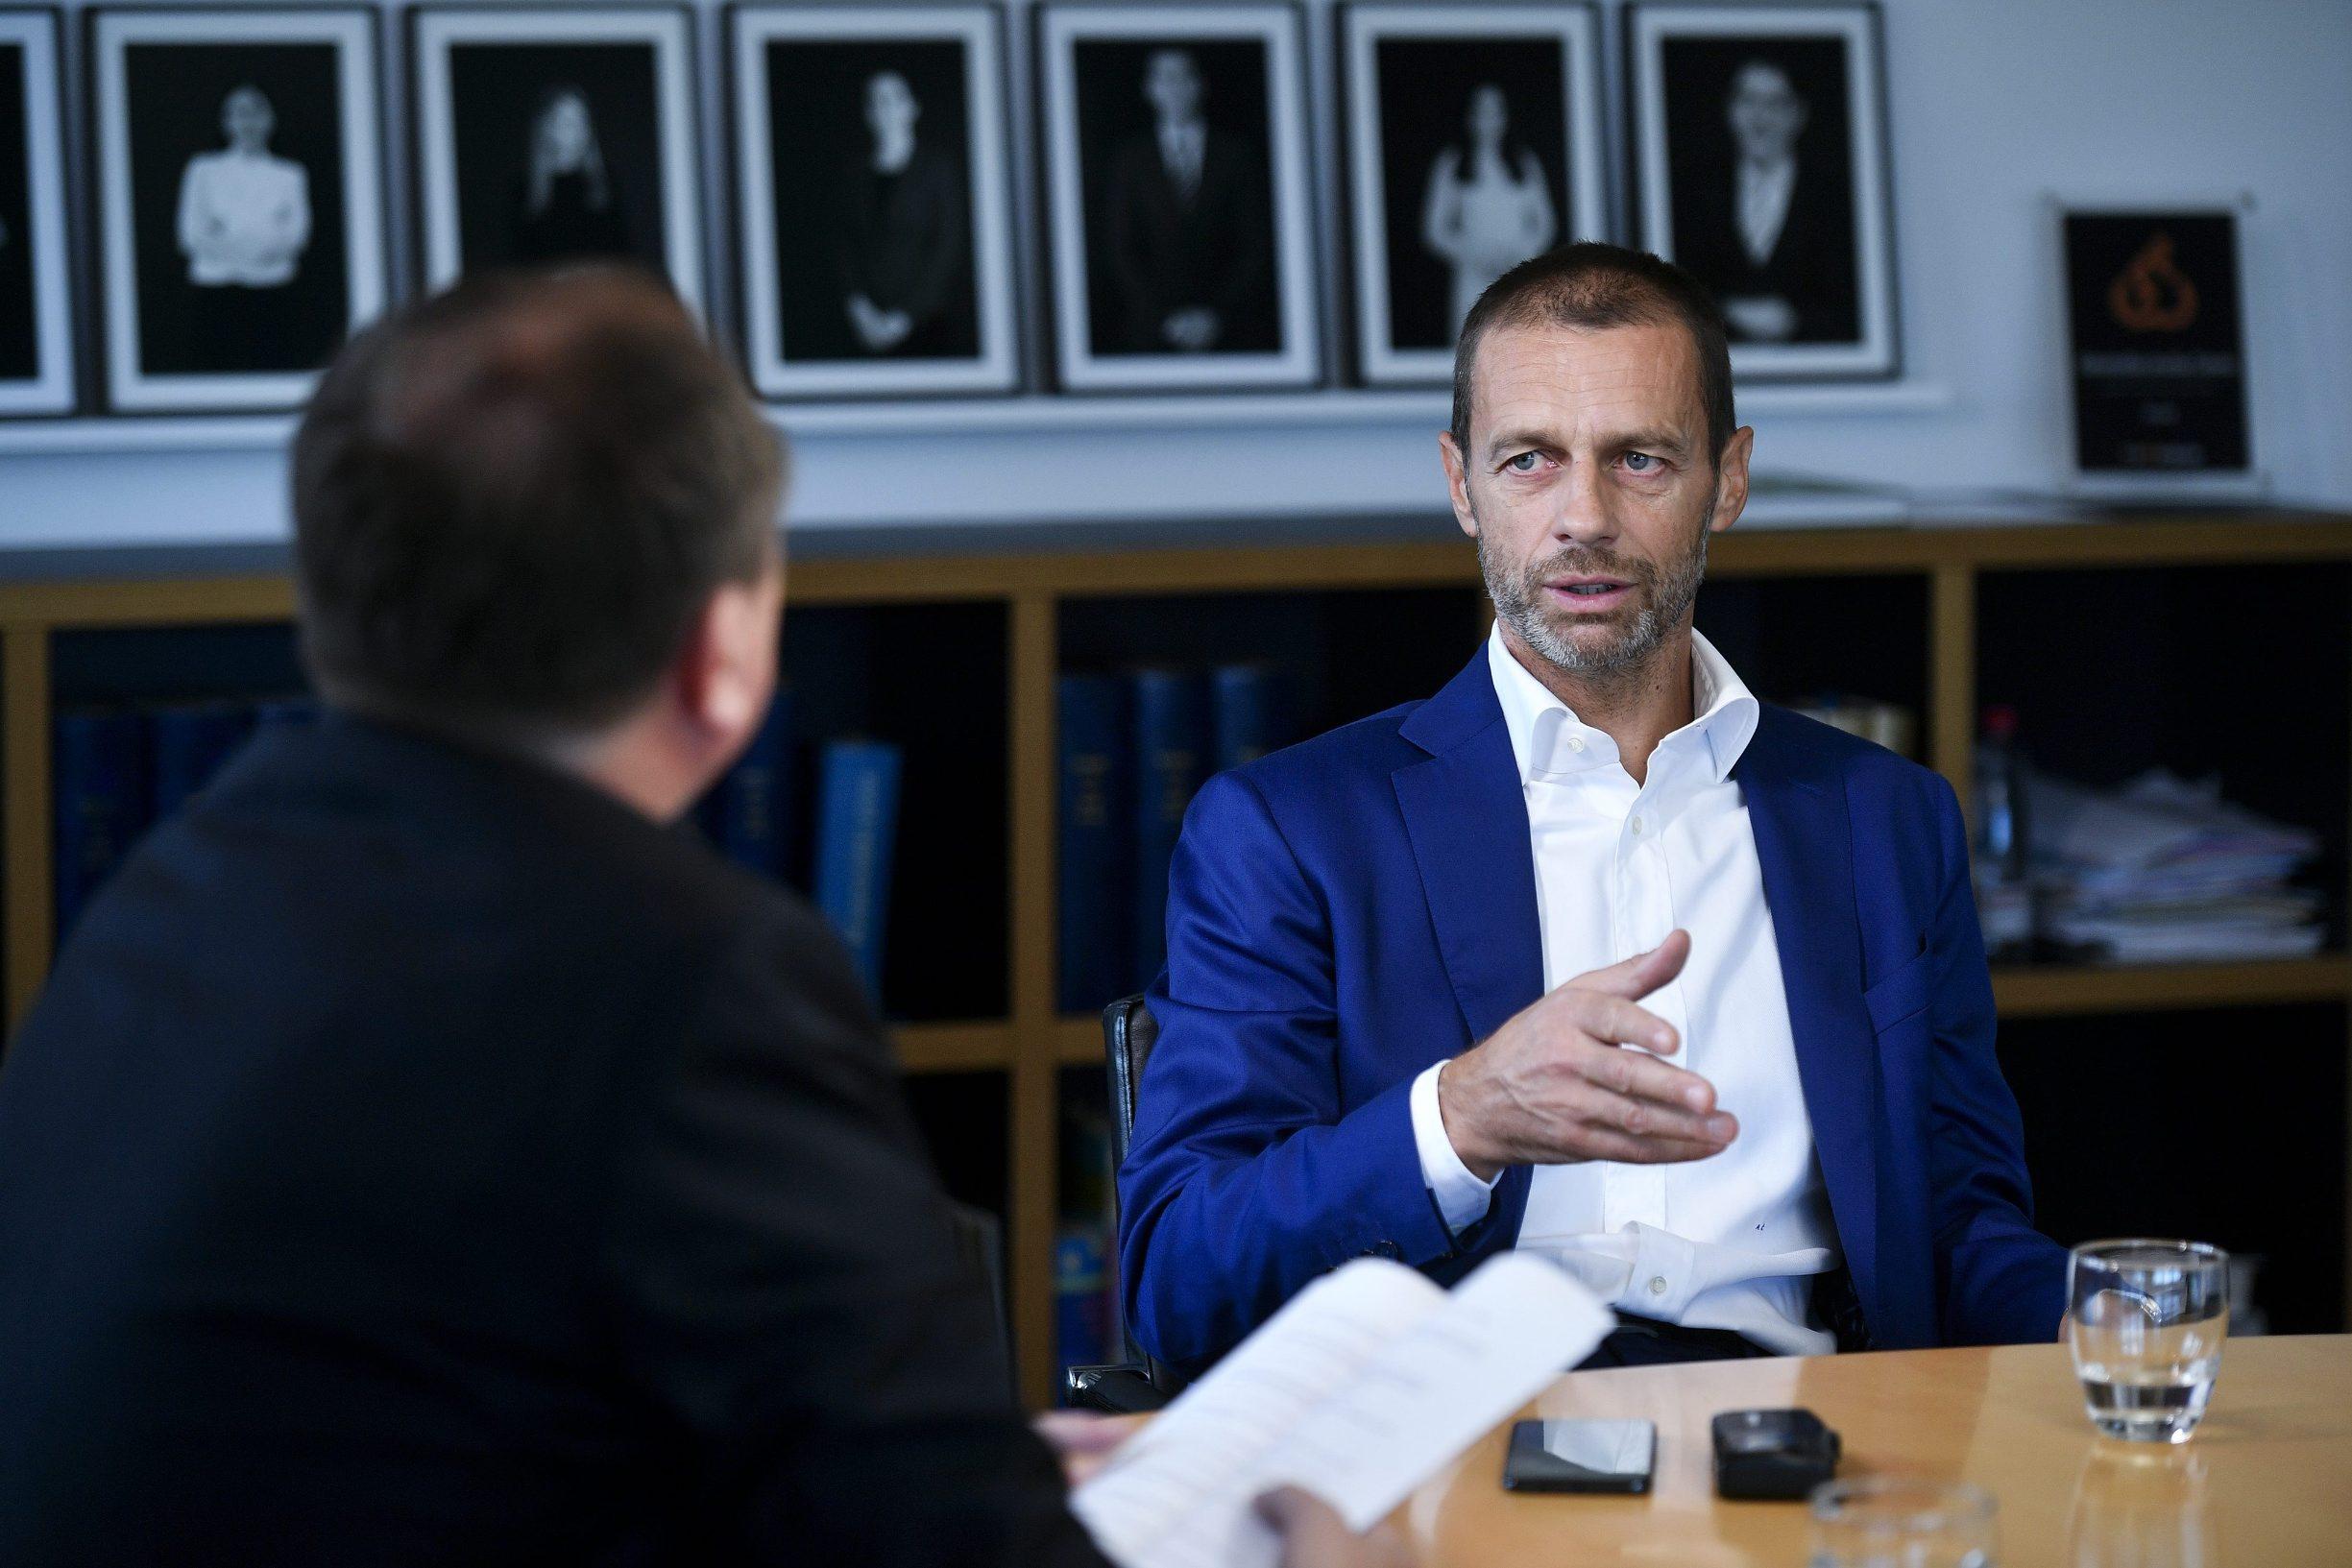 Ljubljana, 270919. Predsjednik UEFA-e Aleksander Ceferin, fotografiran za vrijeme intervjua u Odvjetnickom drustvu Ceferin. Foto: Boris Kovacev / CROPIX